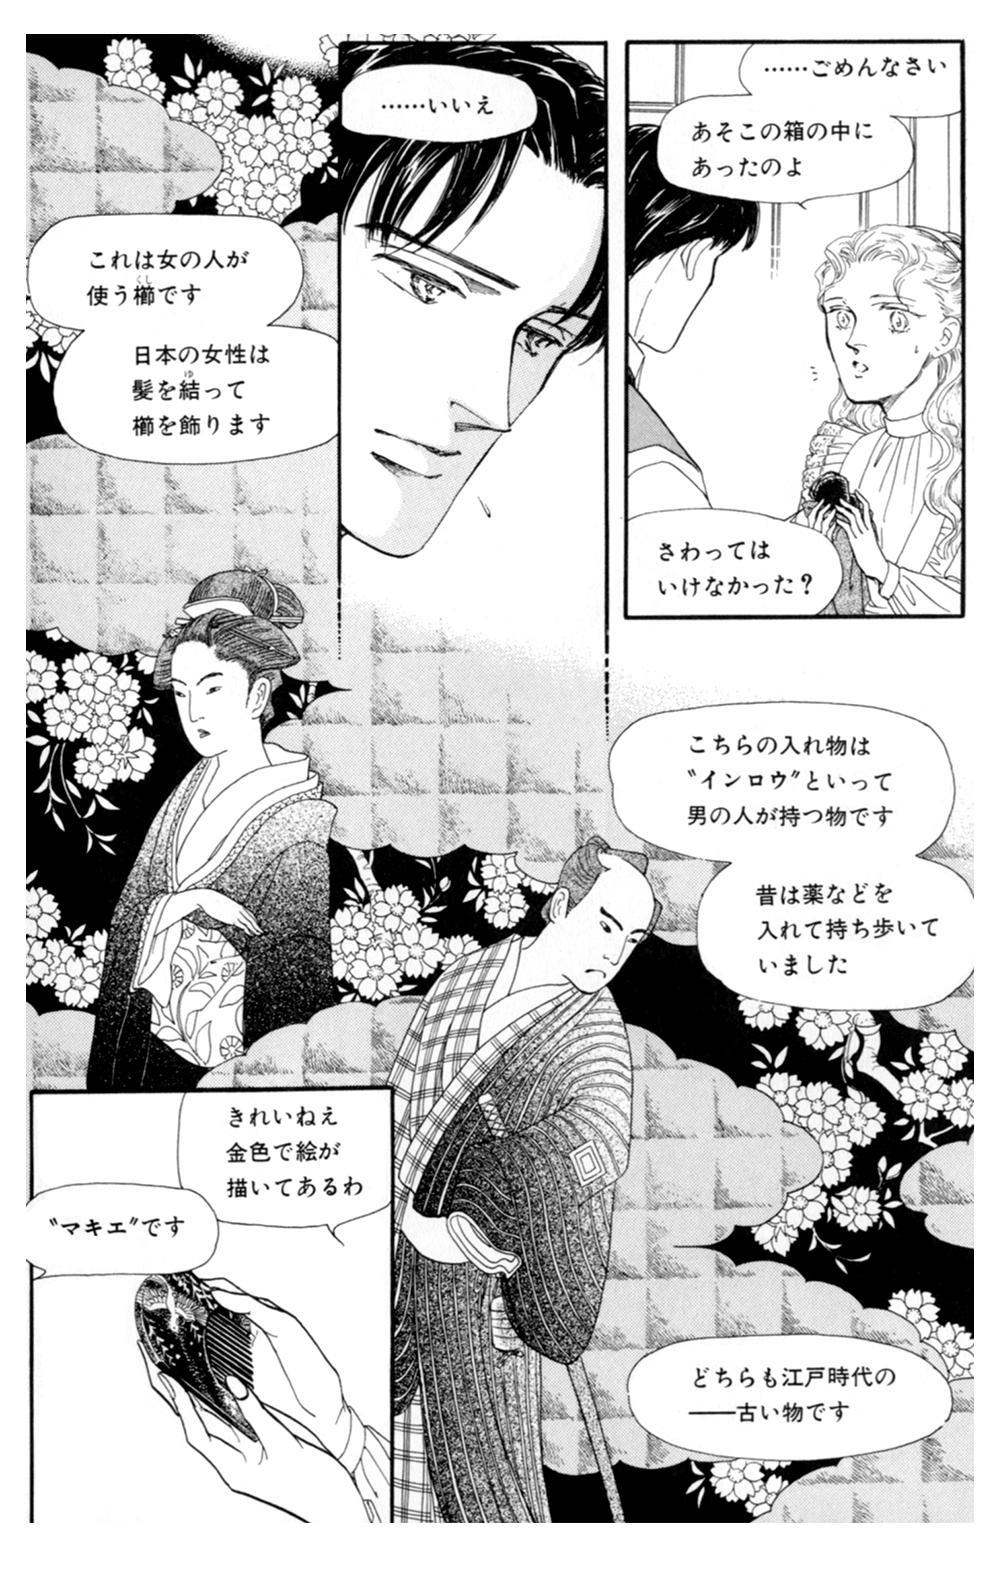 雨柳堂夢咄 第7話「金色の鶏」①uryudo-04-166.jpg